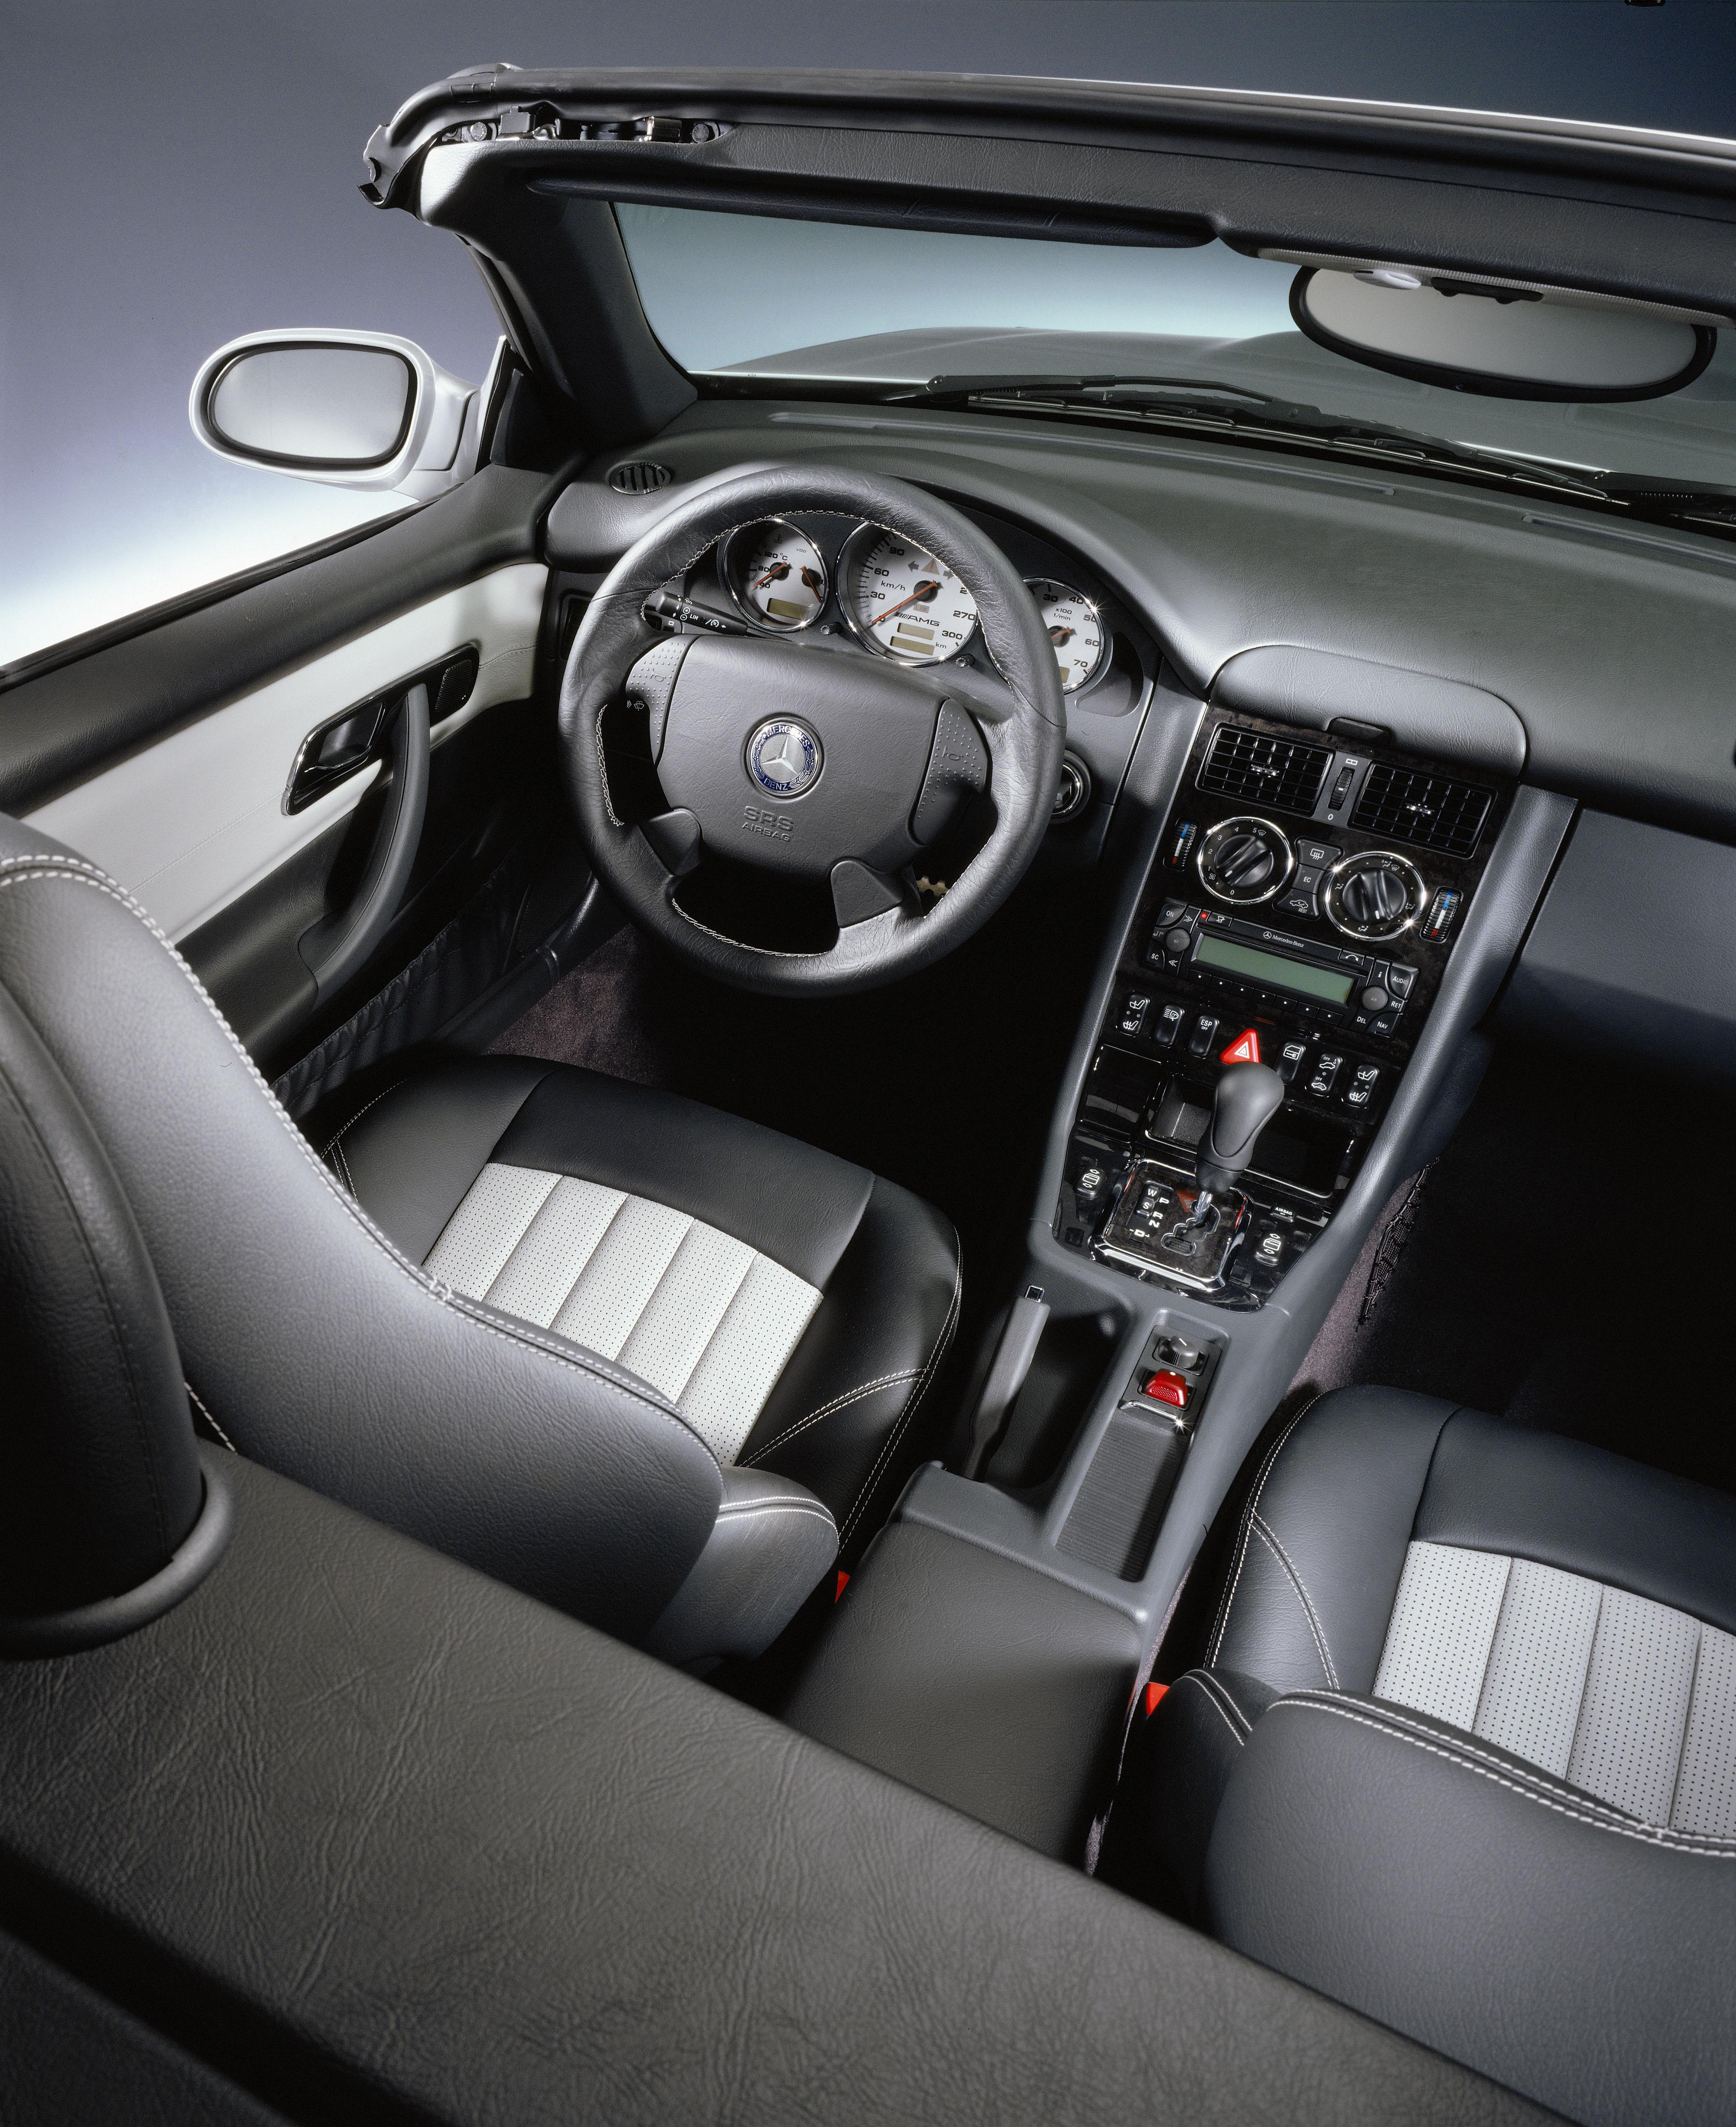 Cabrio-Innenraum: Regelmäßige Pflege wichtig